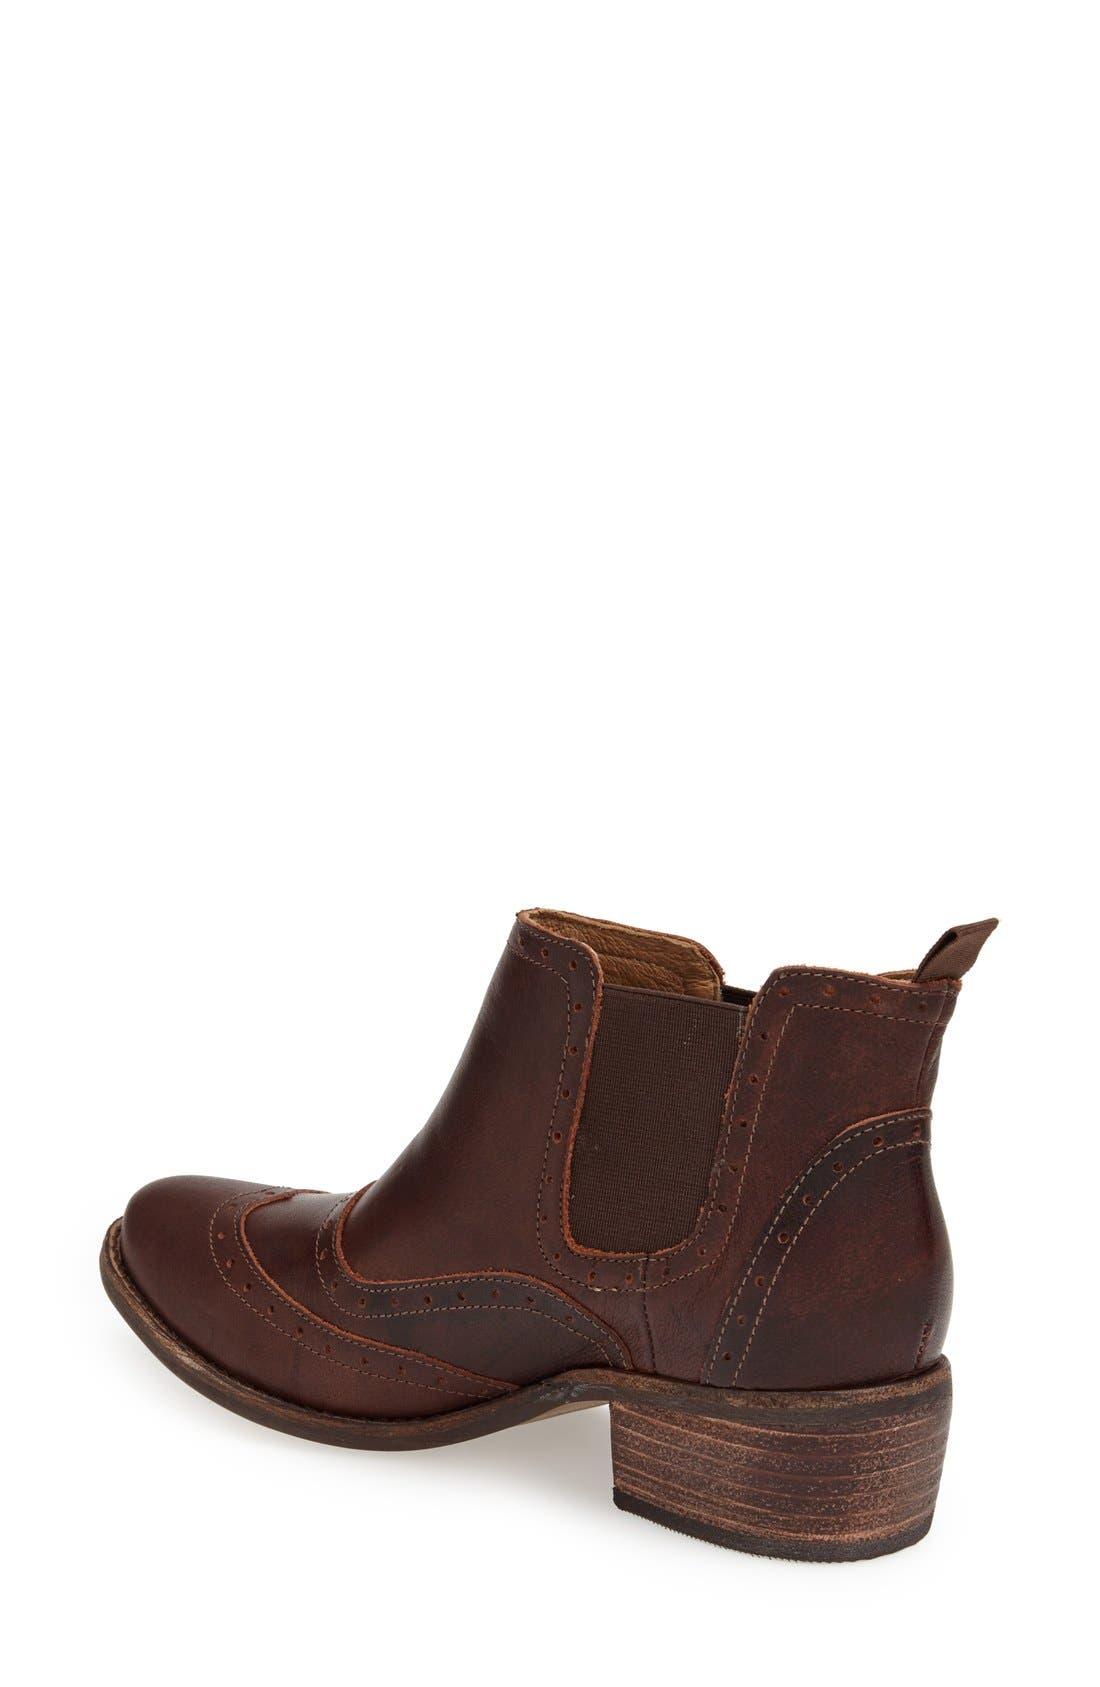 Alternate Image 2  - Matisse 'Rowan' Leather Bootie (Women)